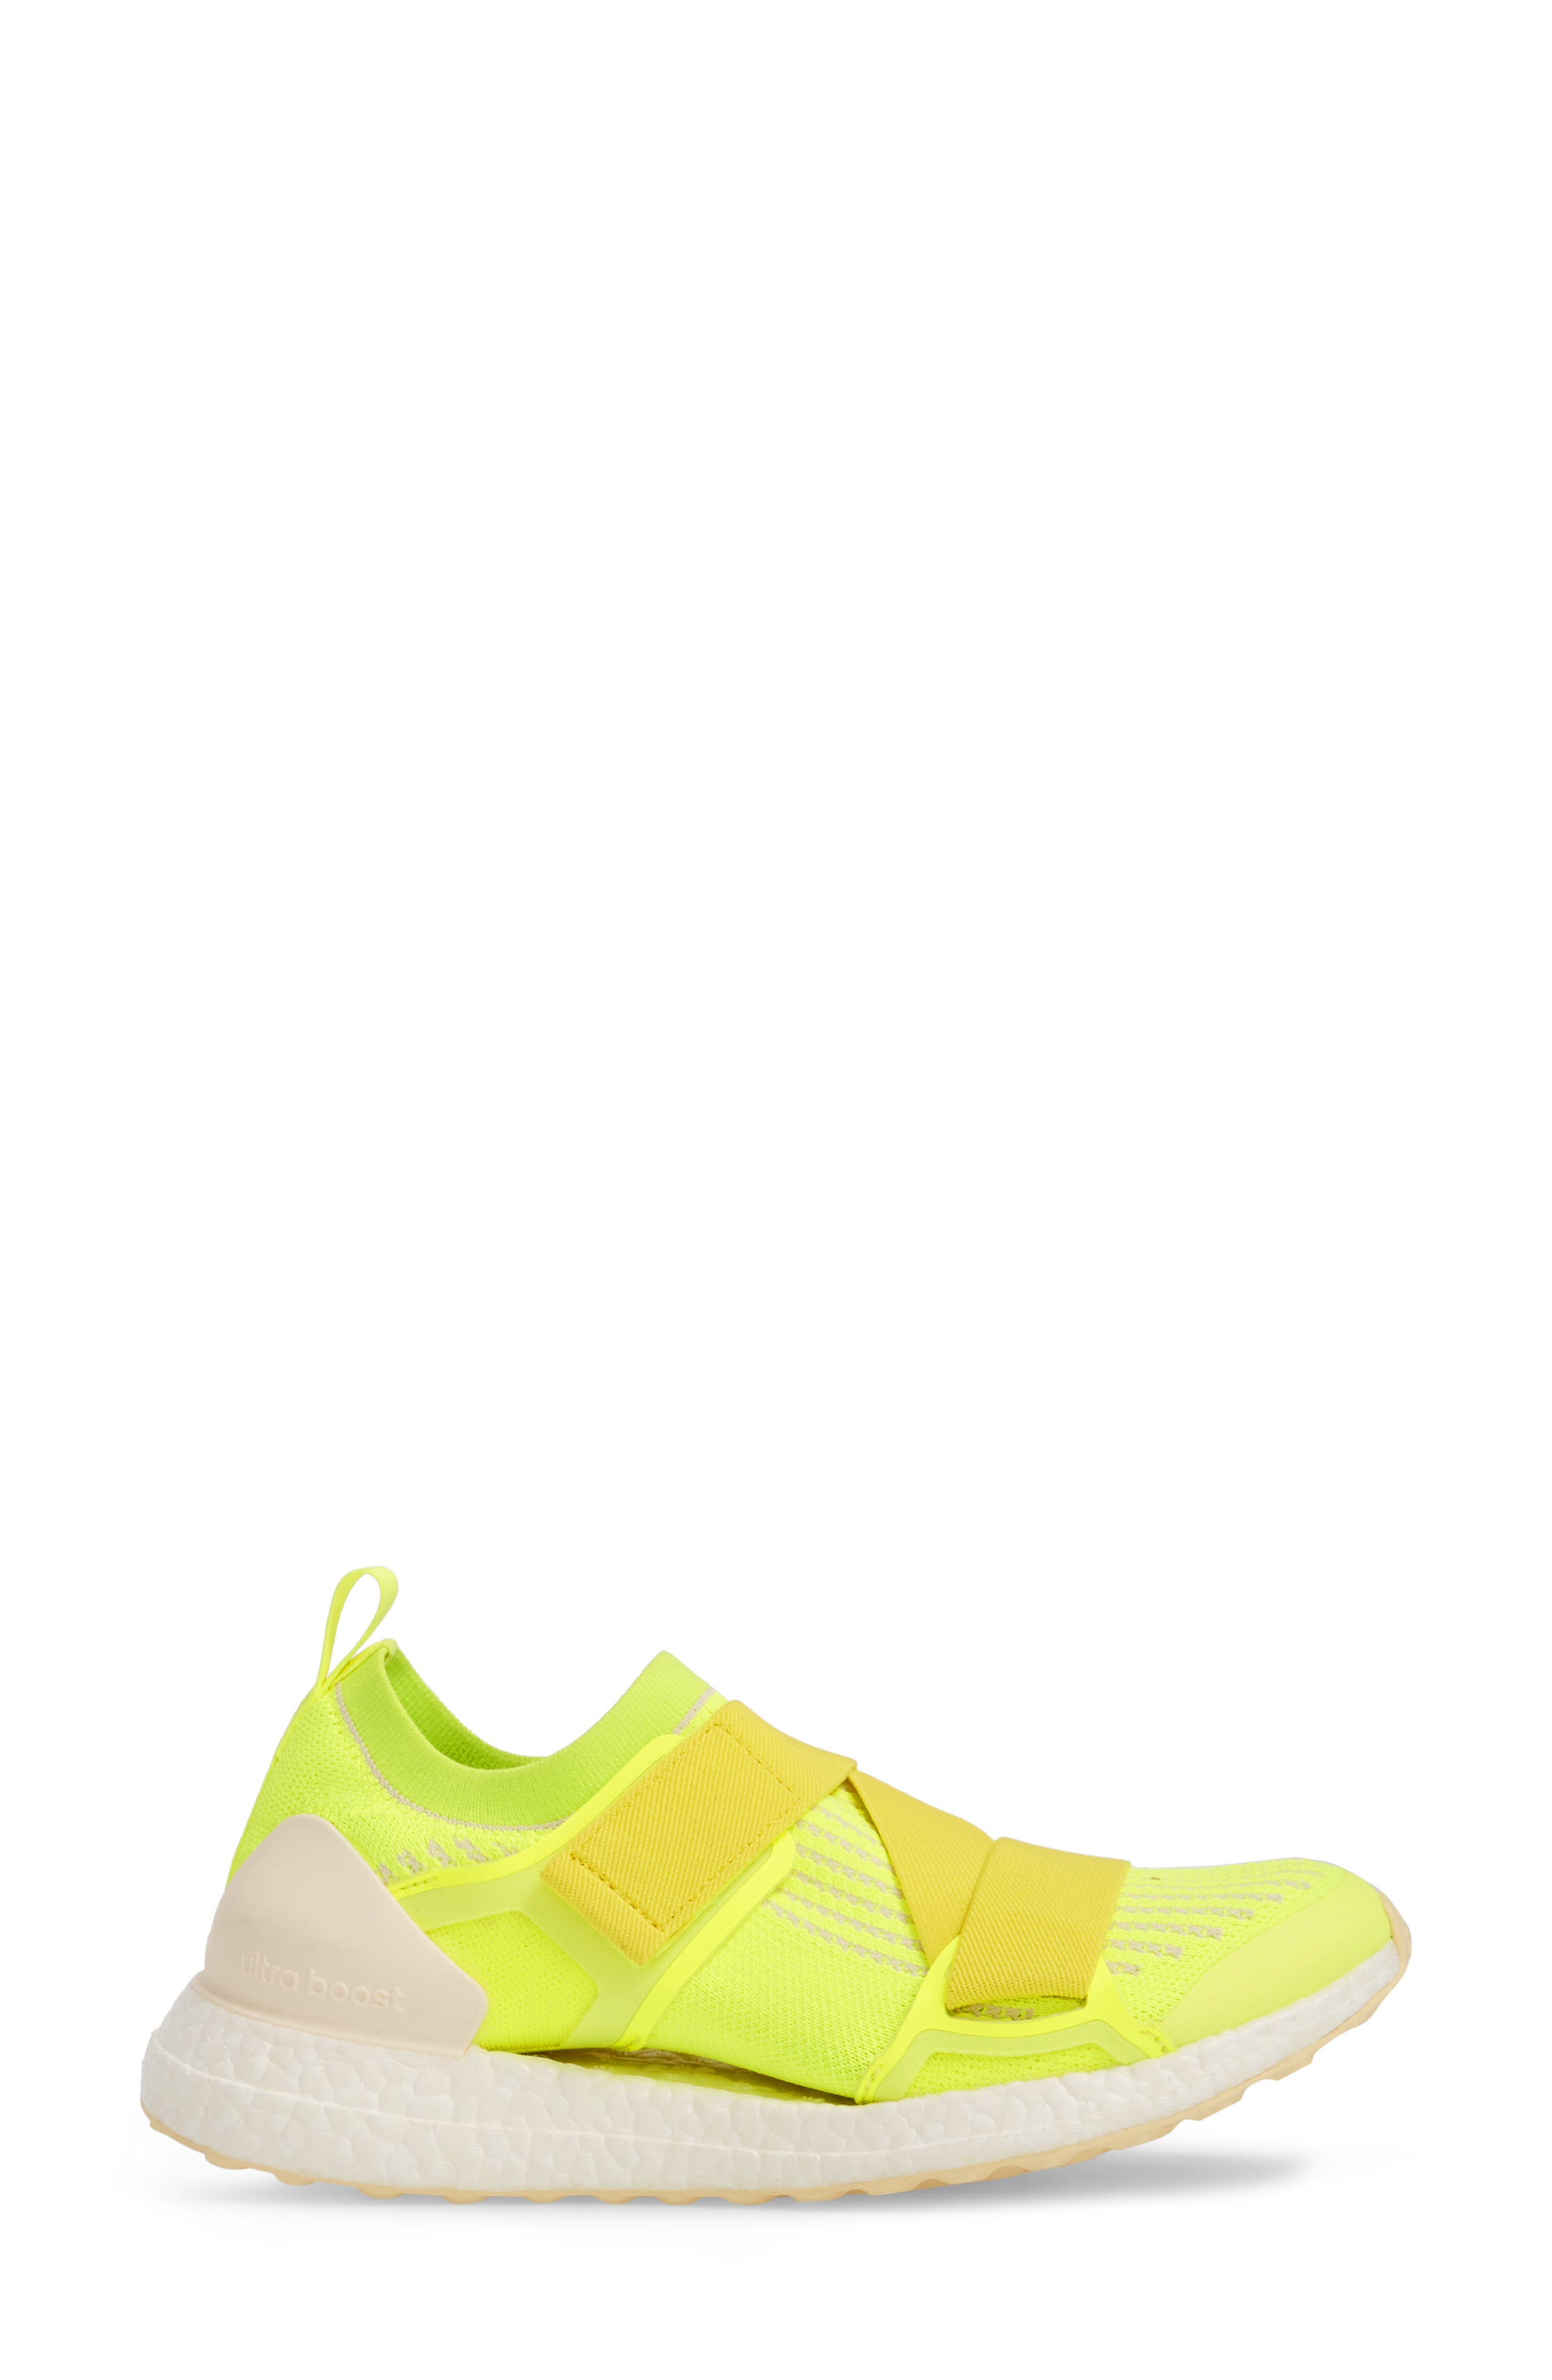 UltraBoost X Running Shoe,                             Alternate thumbnail 3, color,                             SOLAR YELLOW/ YELLOW/ SUN